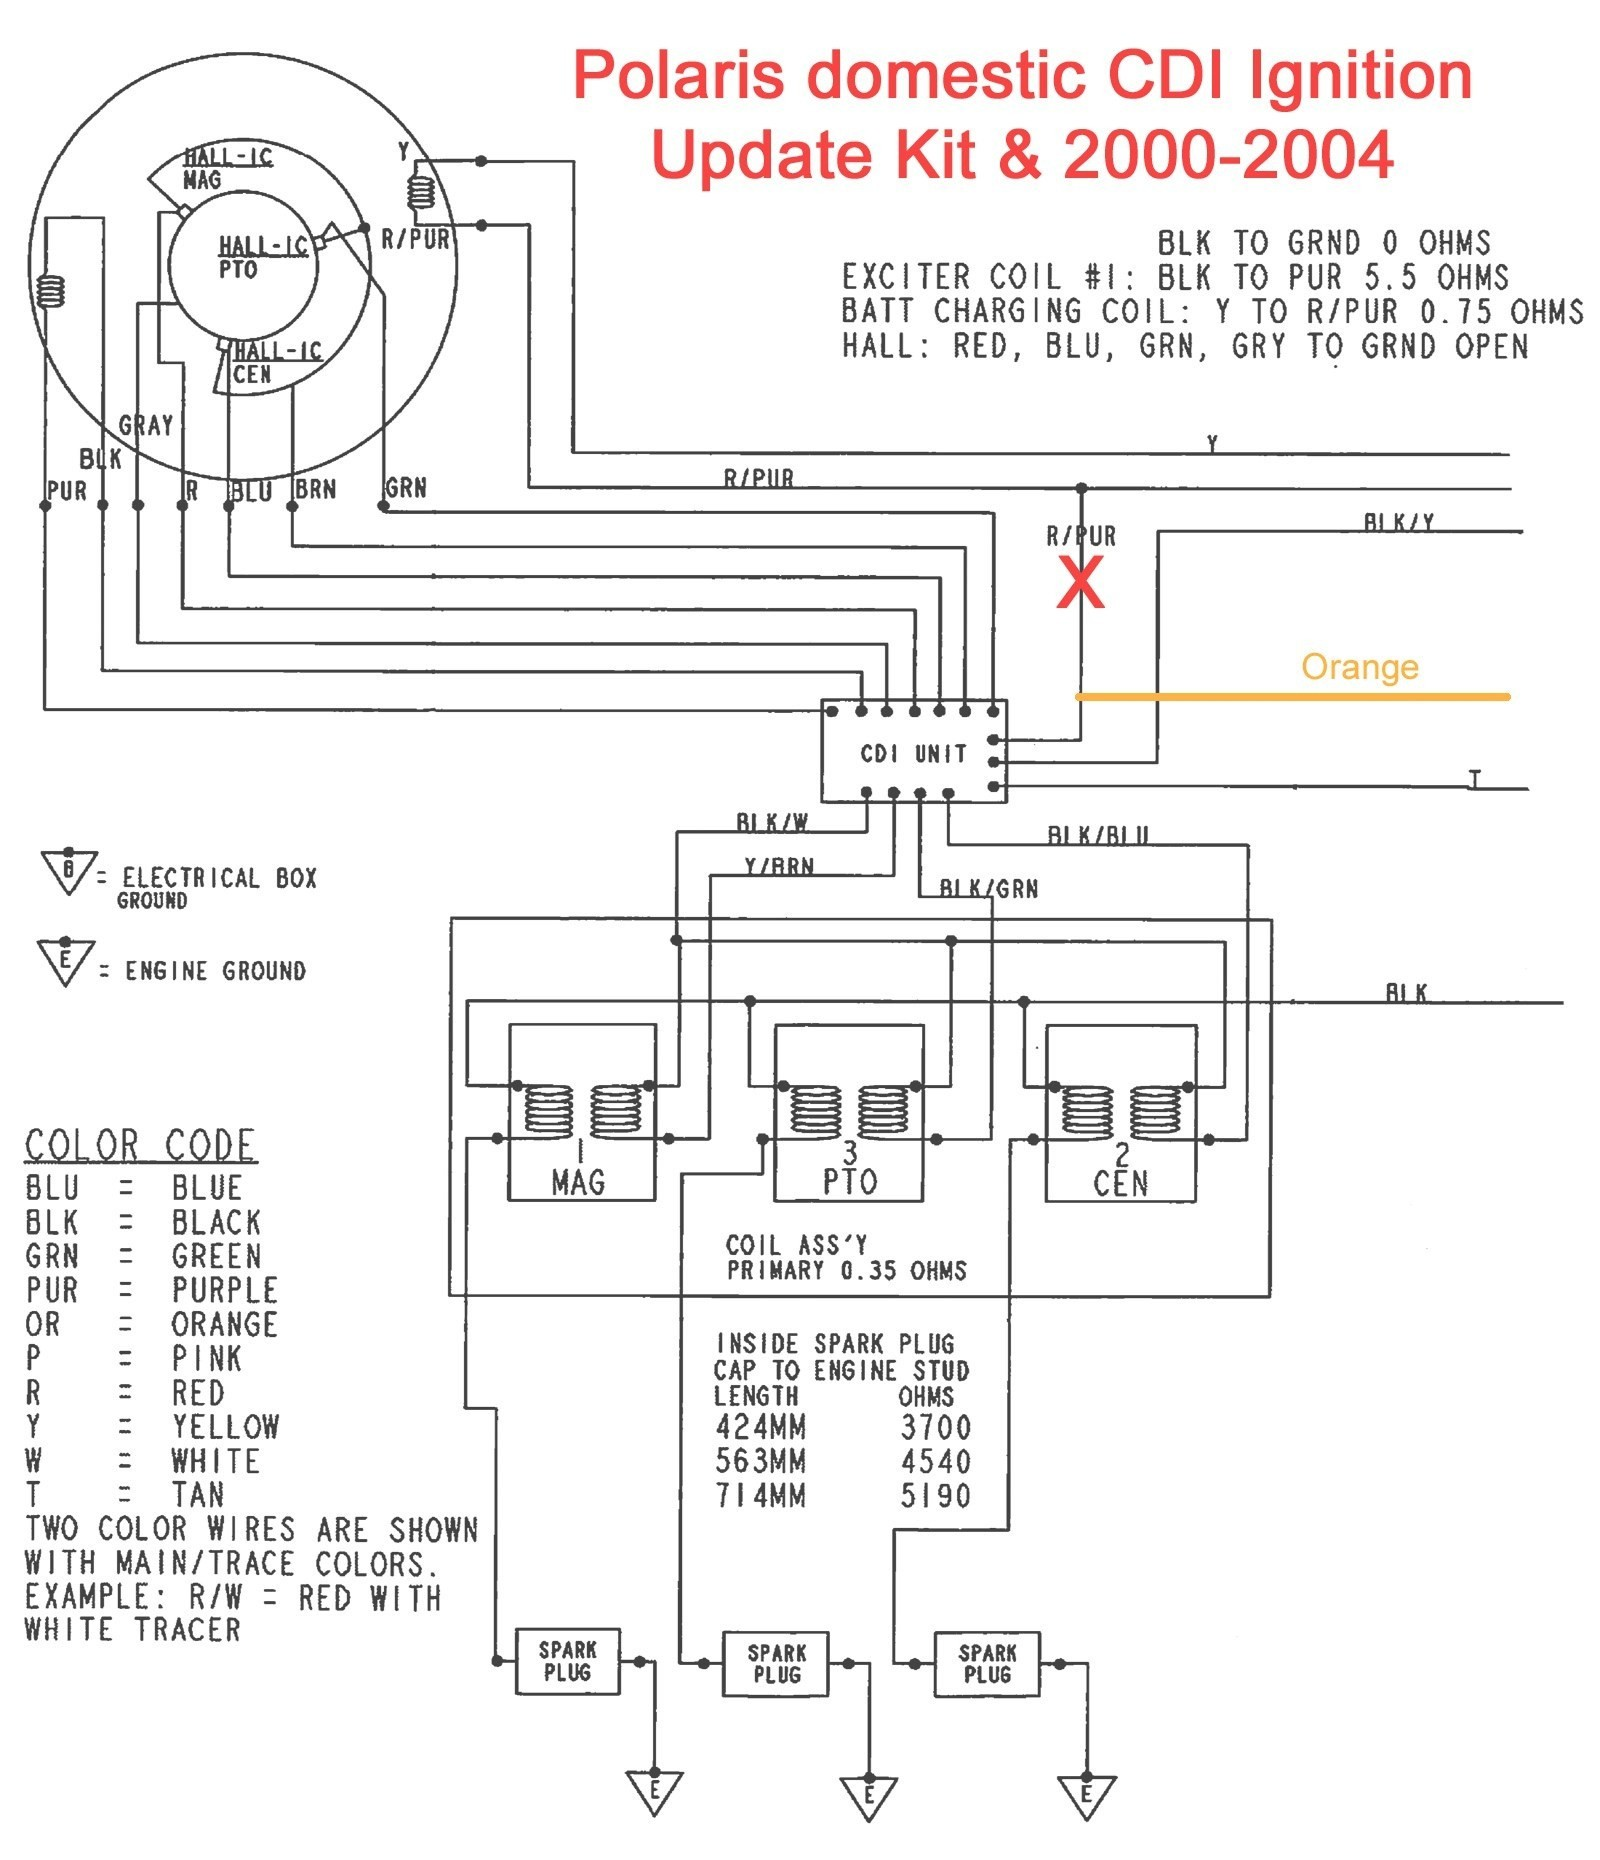 Polaris Predator 500 Engine Diagram Wiring Diagram for Polaris Scrambler 90 Polaris Scrambler 90 Of Polaris Predator 500 Engine Diagram